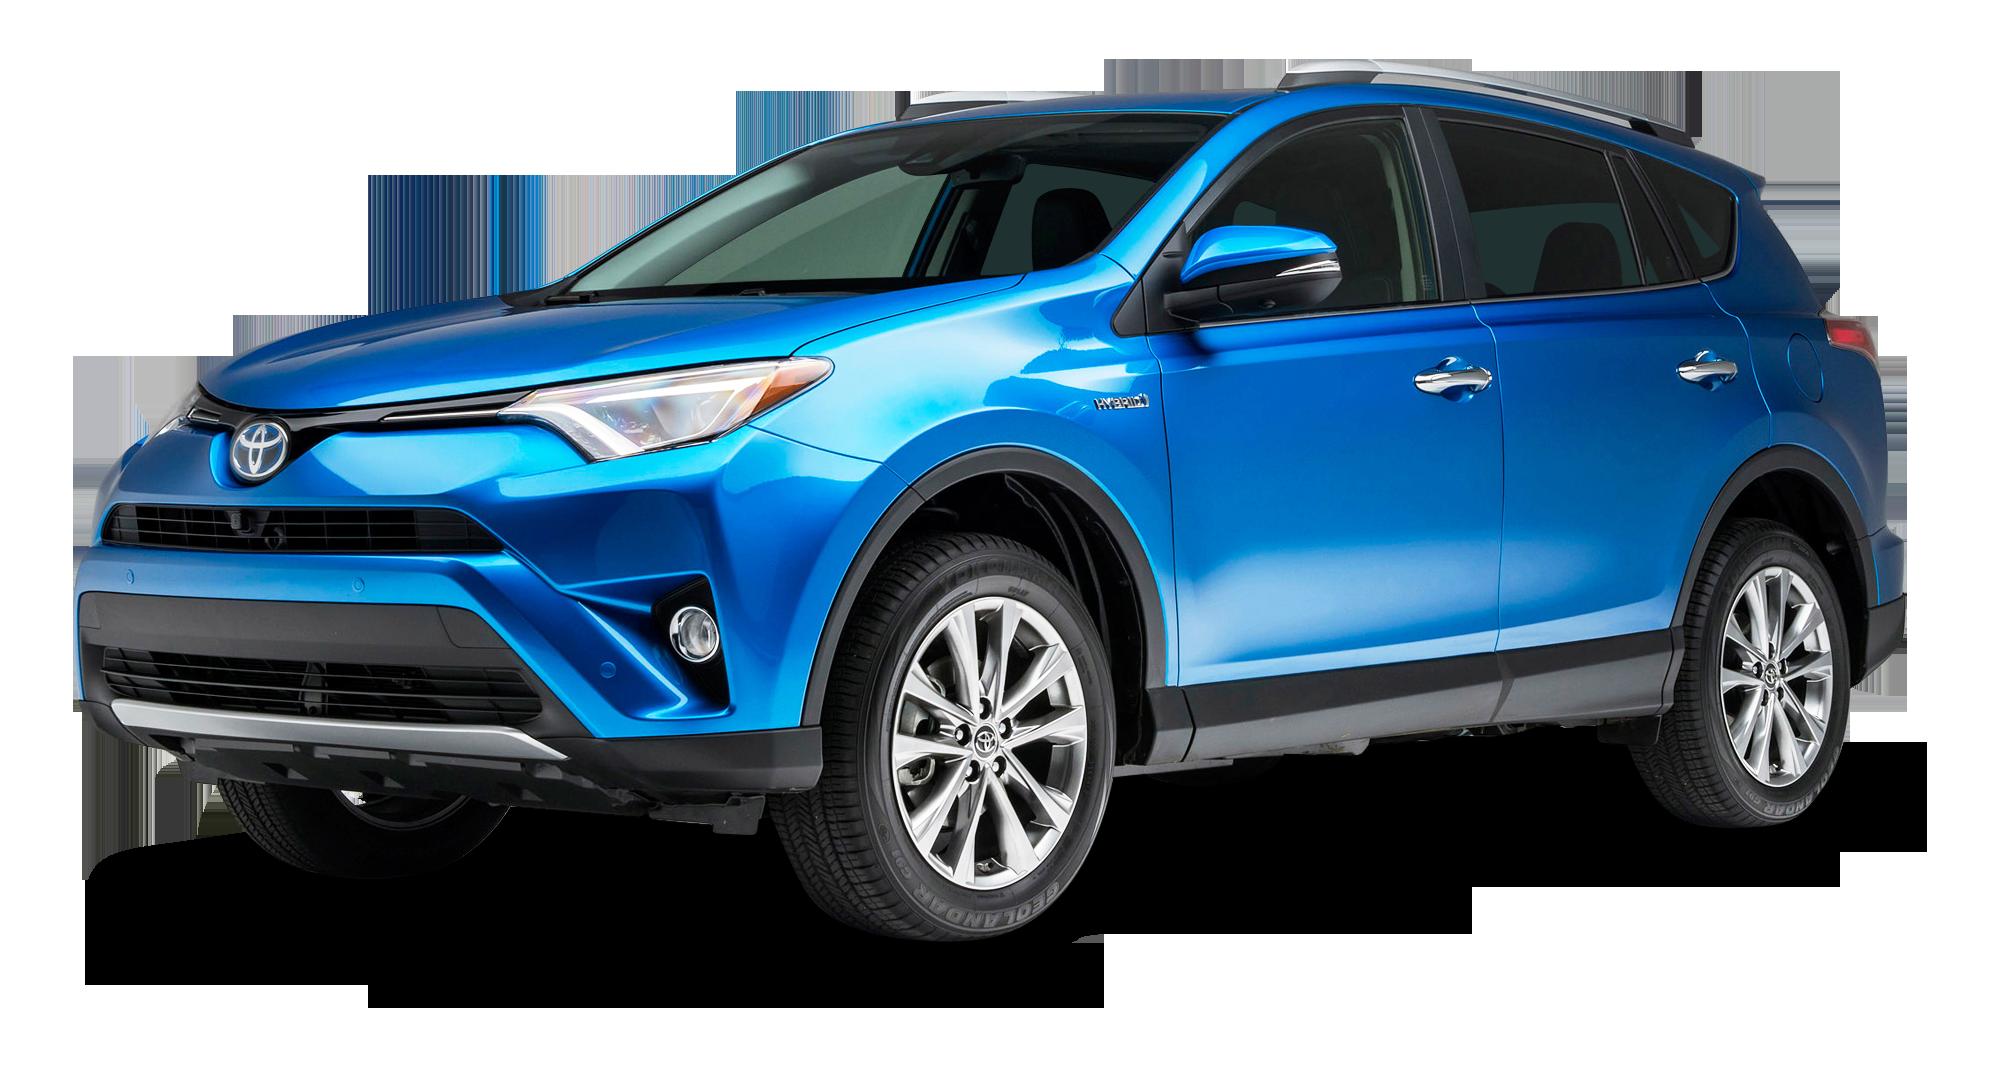 Blue Toyota RAV4 Hybrid Car PNG Image - Toyota PNG